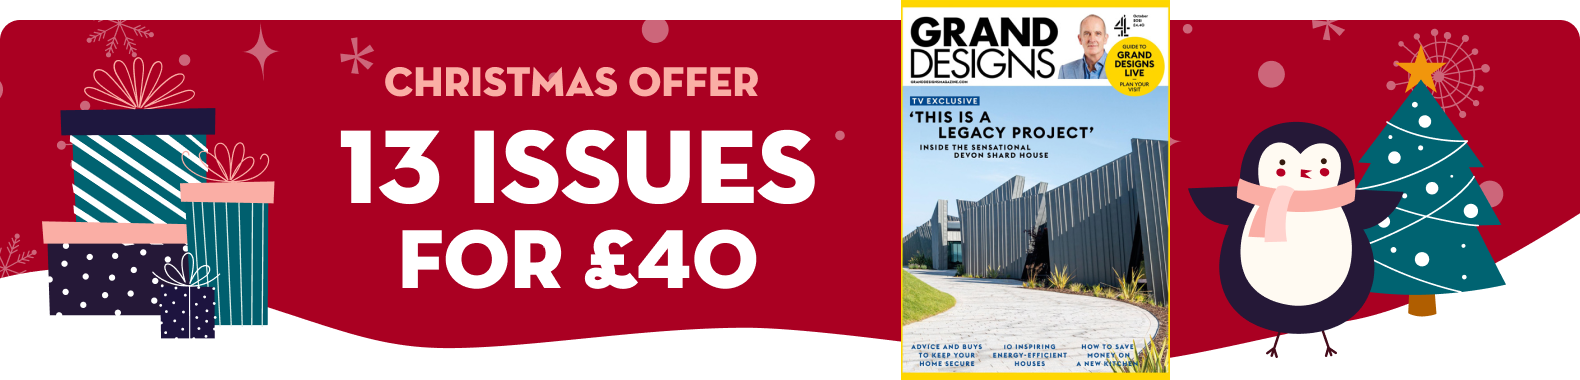 Grand Designs - XMAS2021